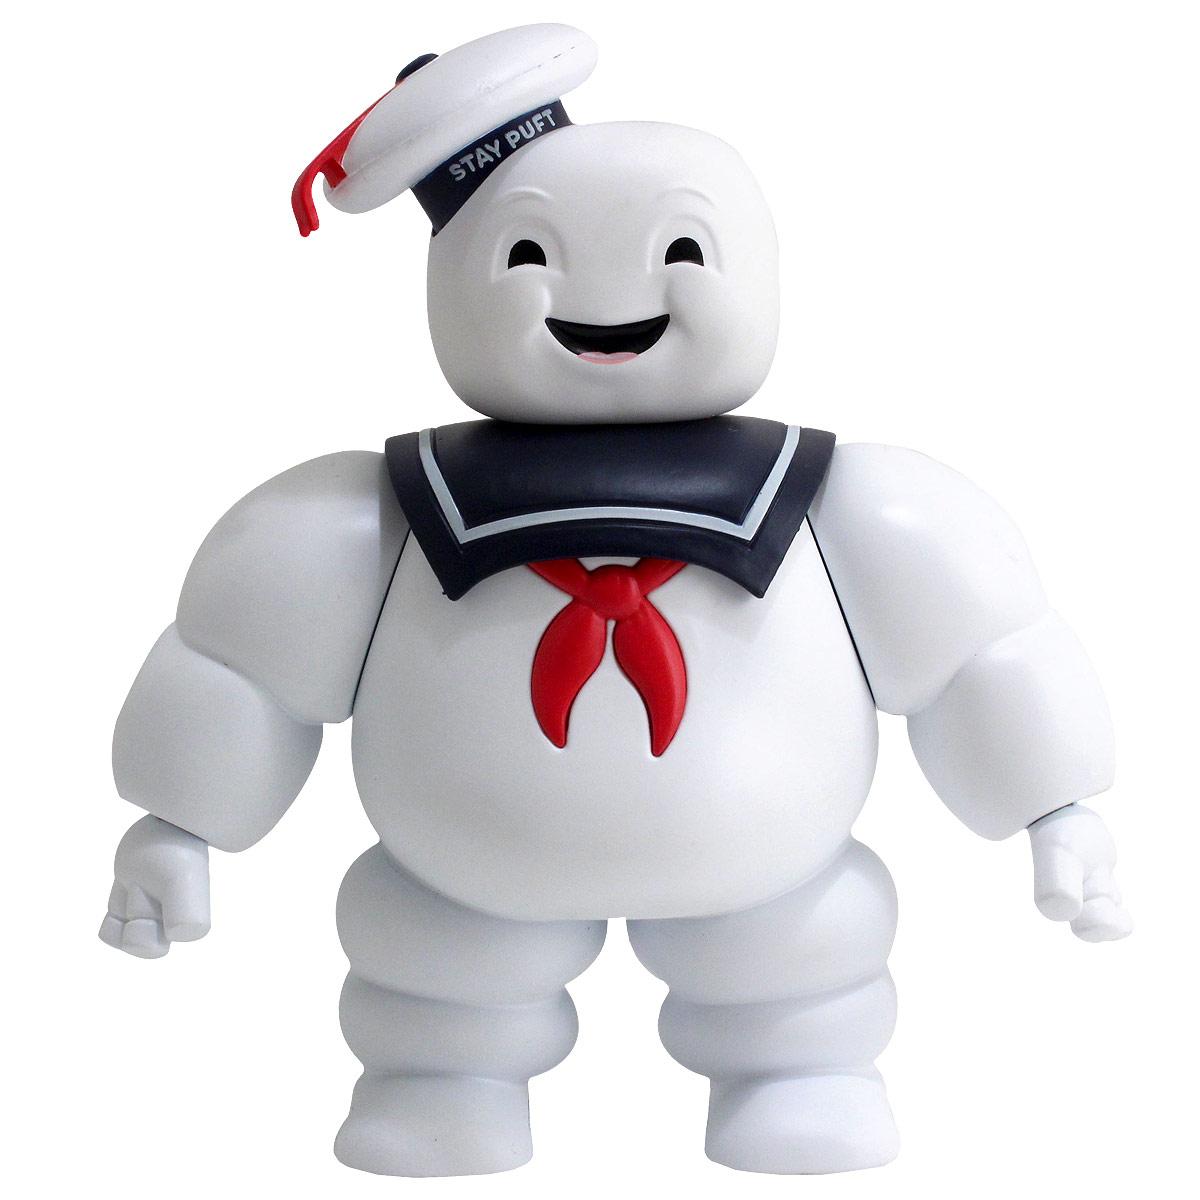 Jada Охотники за привидениями Фигурка Puft Marshmallow Man tanix tx8 mini android 6 0 marshmallow amlogic s912 tv box